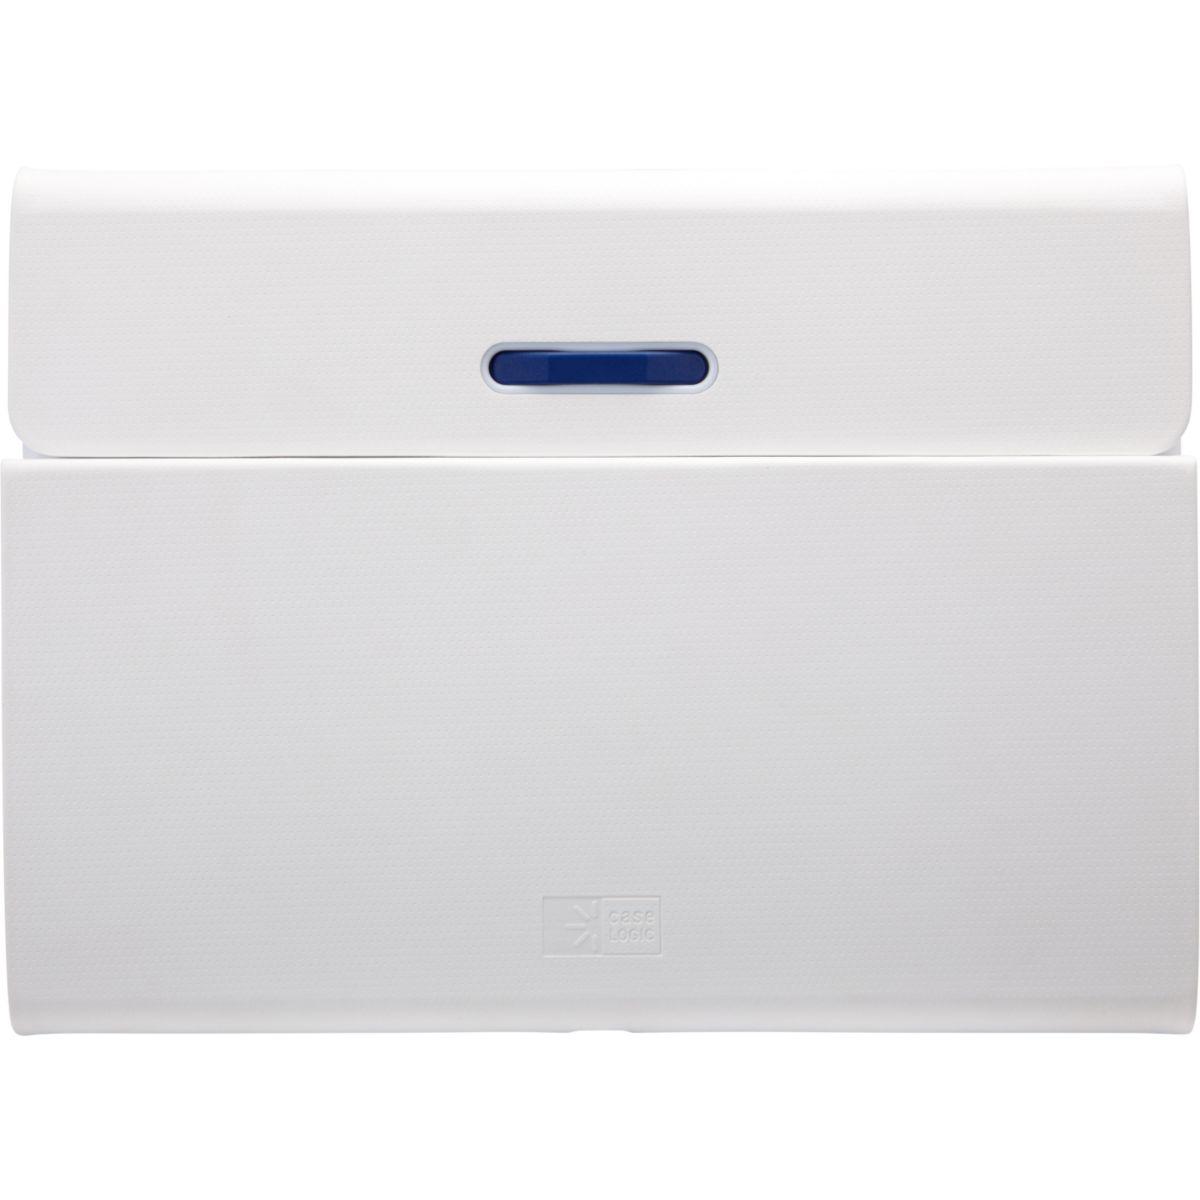 Folio caselogic rotatif semi-rigide tab4 10'' blanc - 20% de remise immédiate avec le code : multi20 (photo)